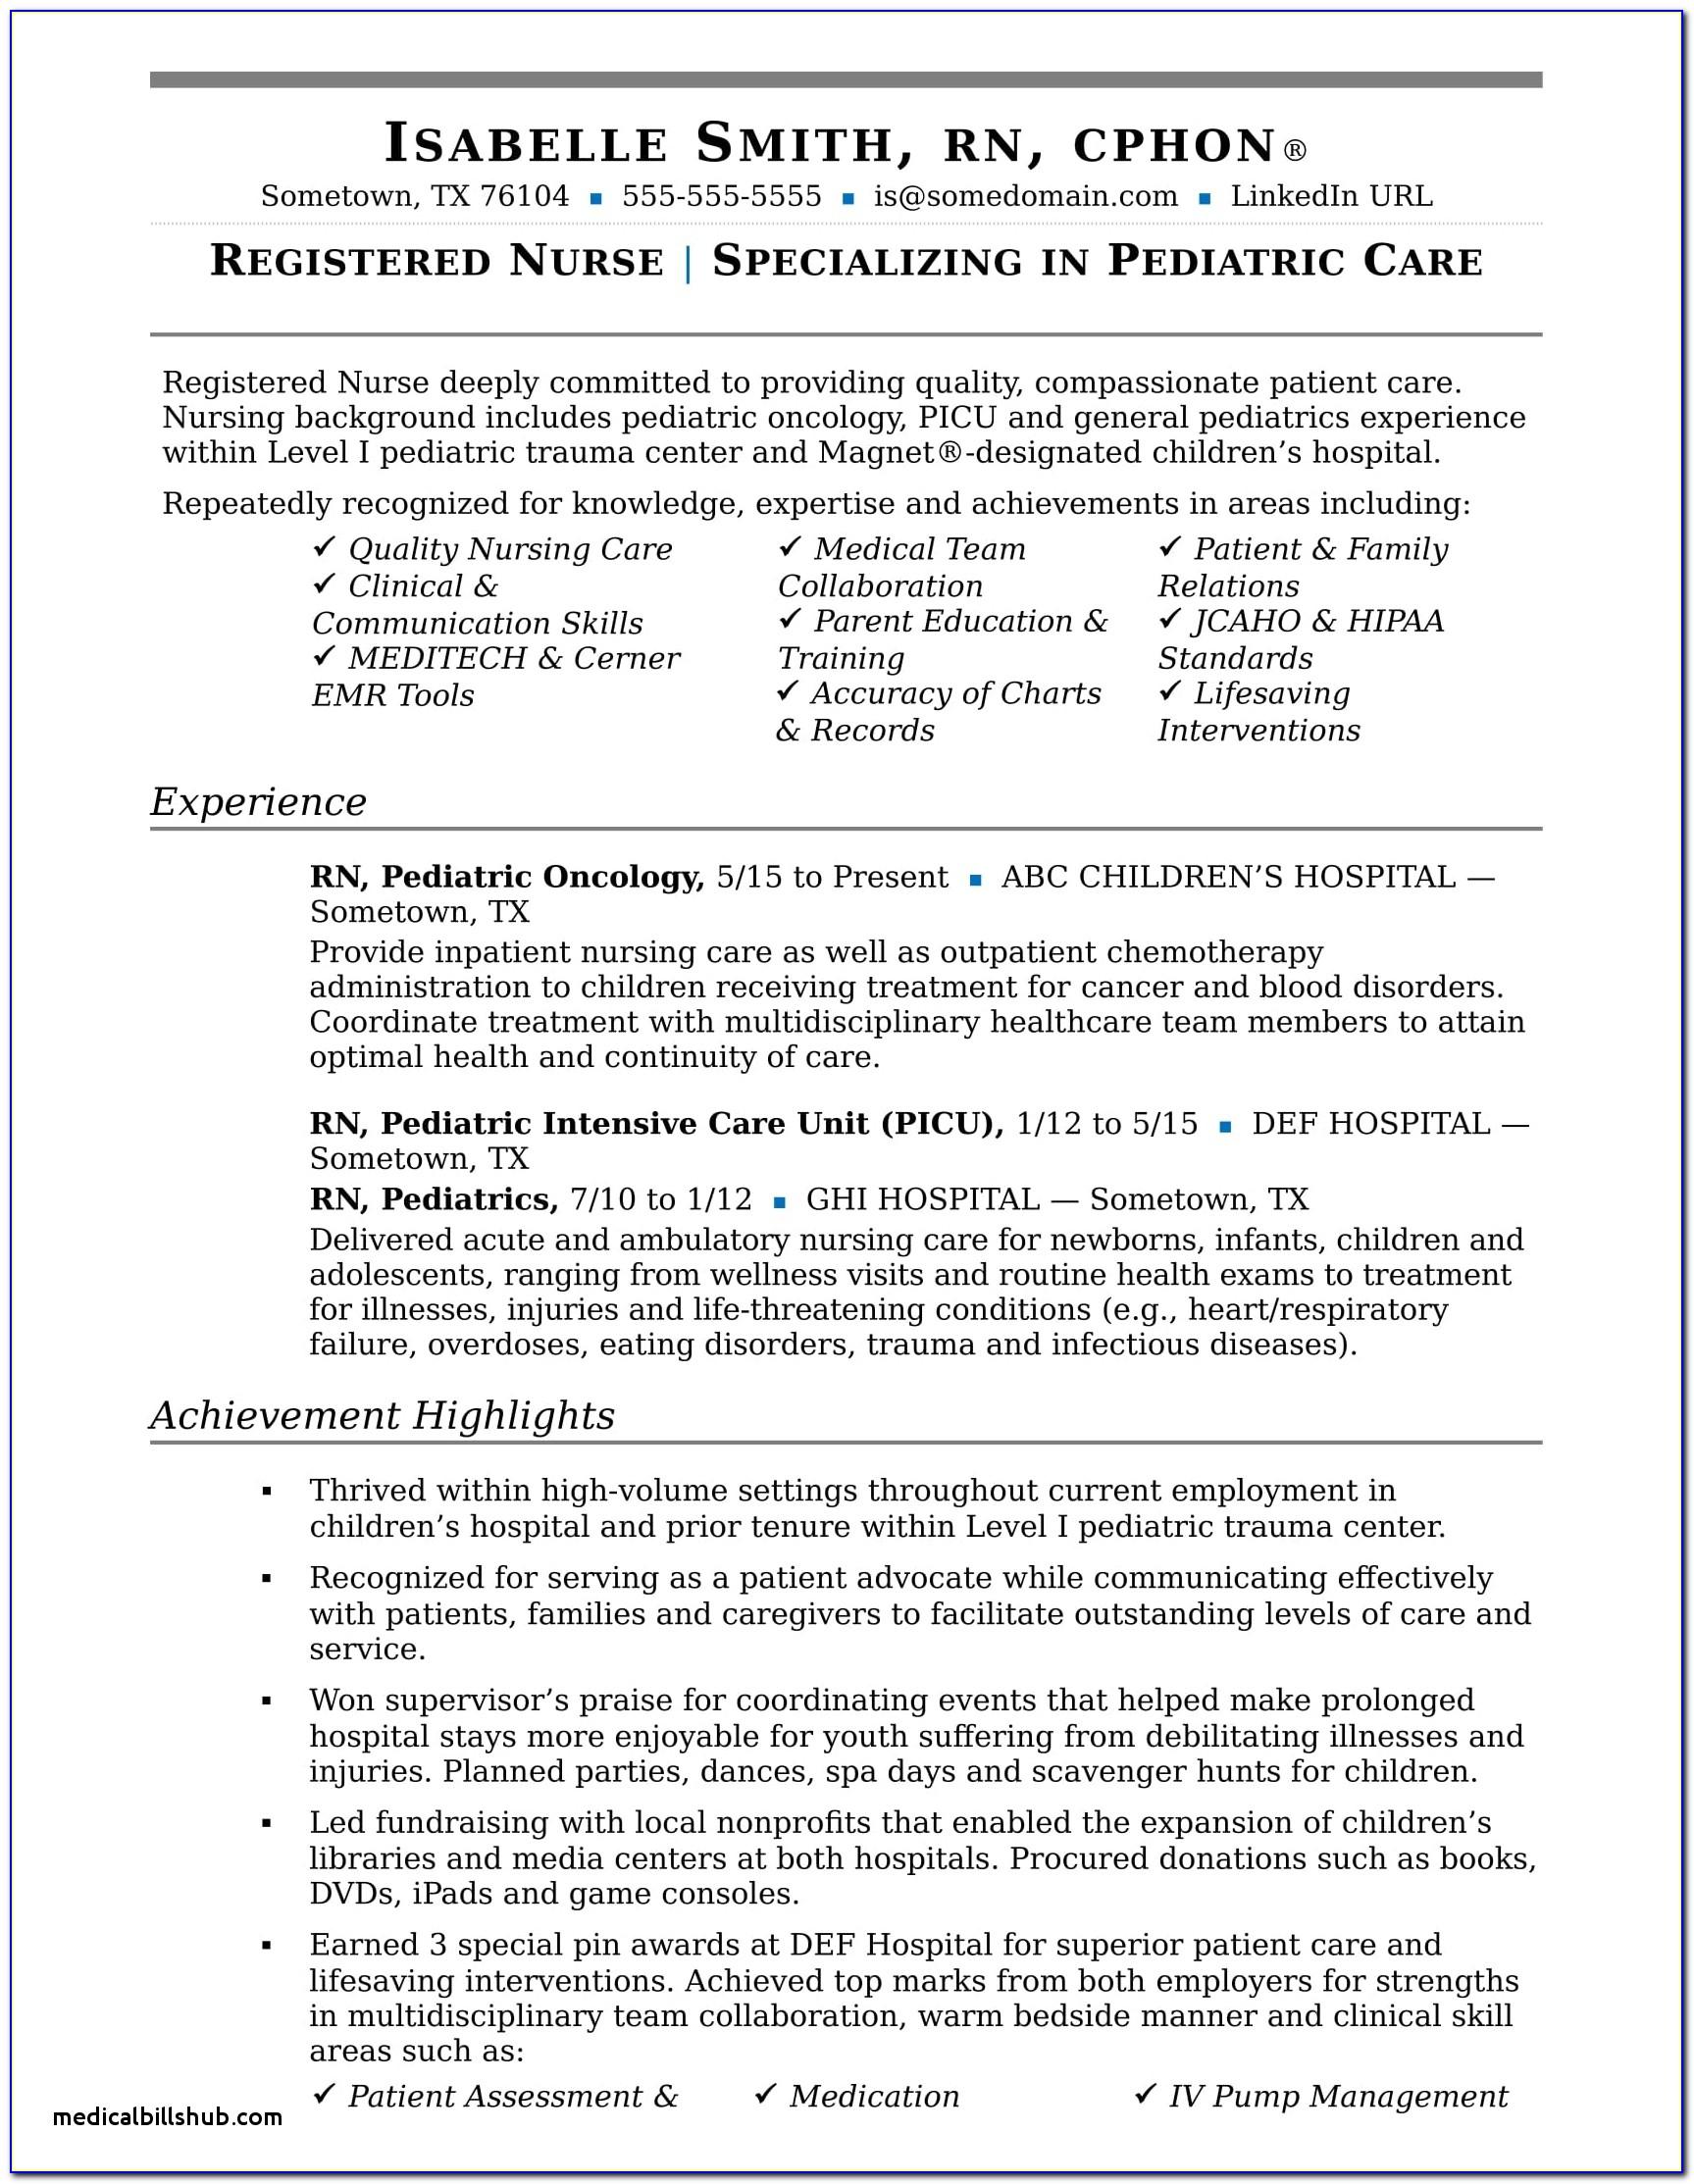 New Grad Nursing Resume Clinical Experience Rn Resume New Grad Experienced Objective Skillsemplate Word Summary